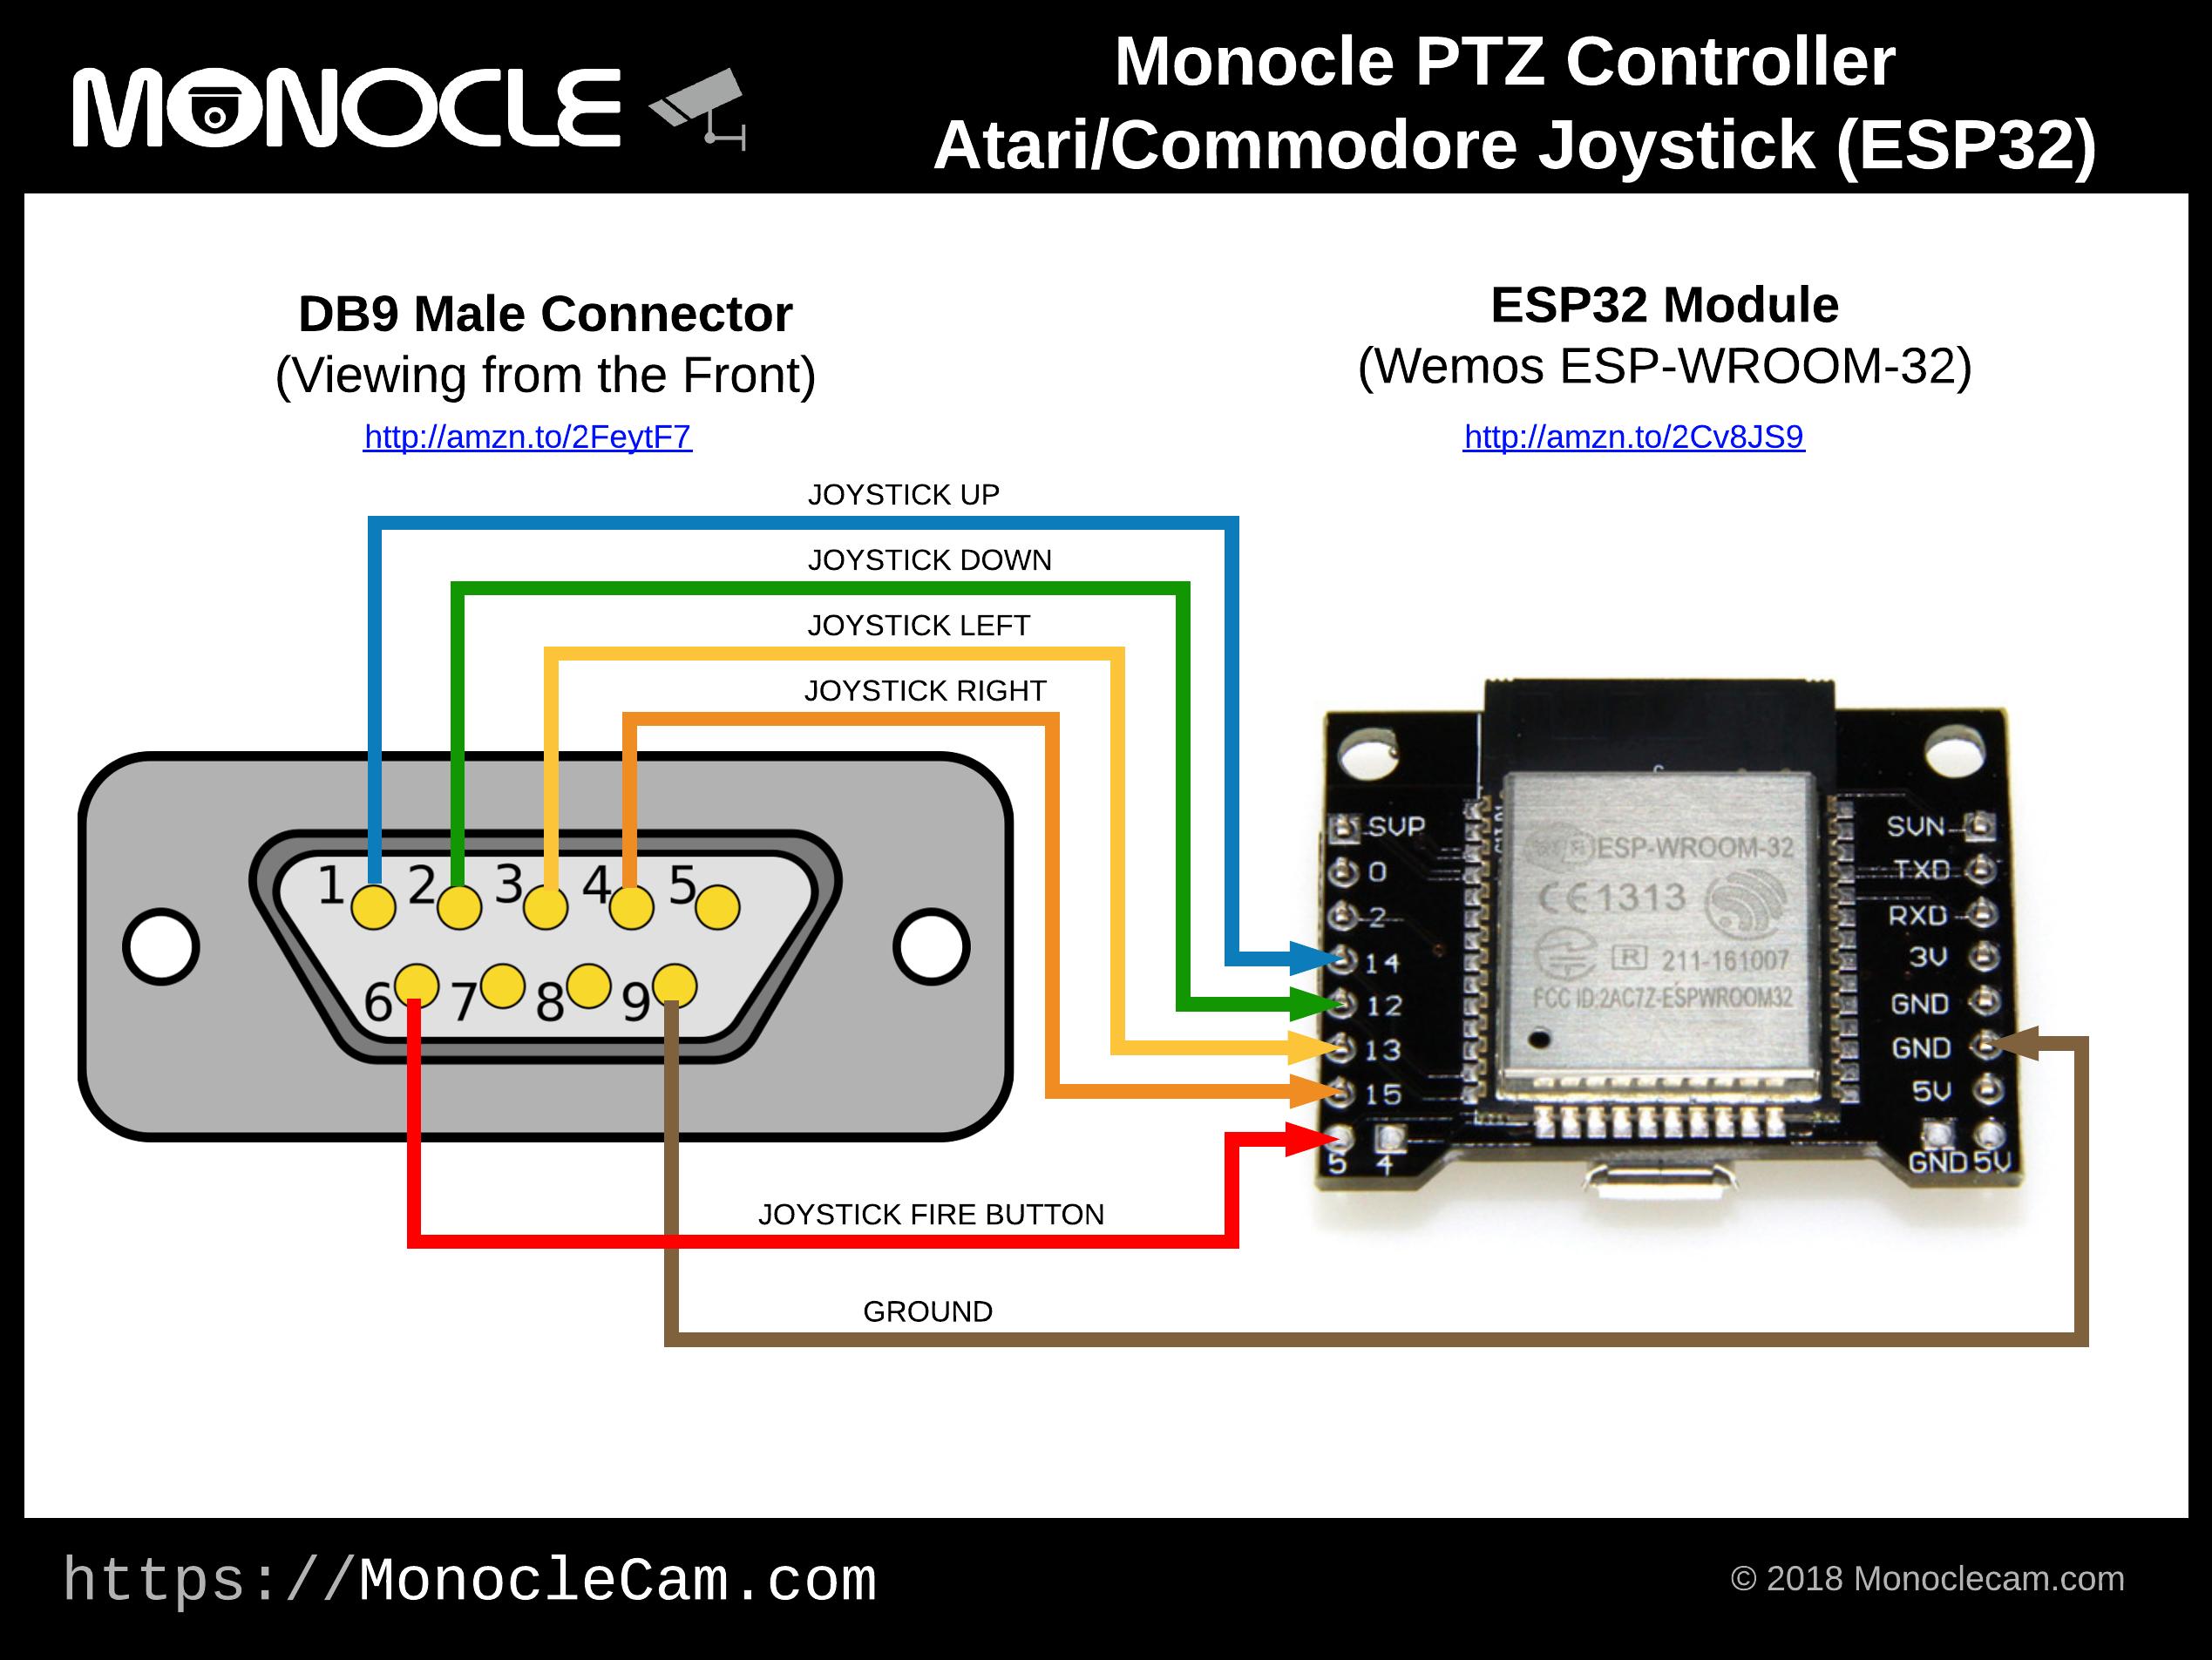 Monocle ptzcontroller atarijoystick esp32 j38zy7zyjv